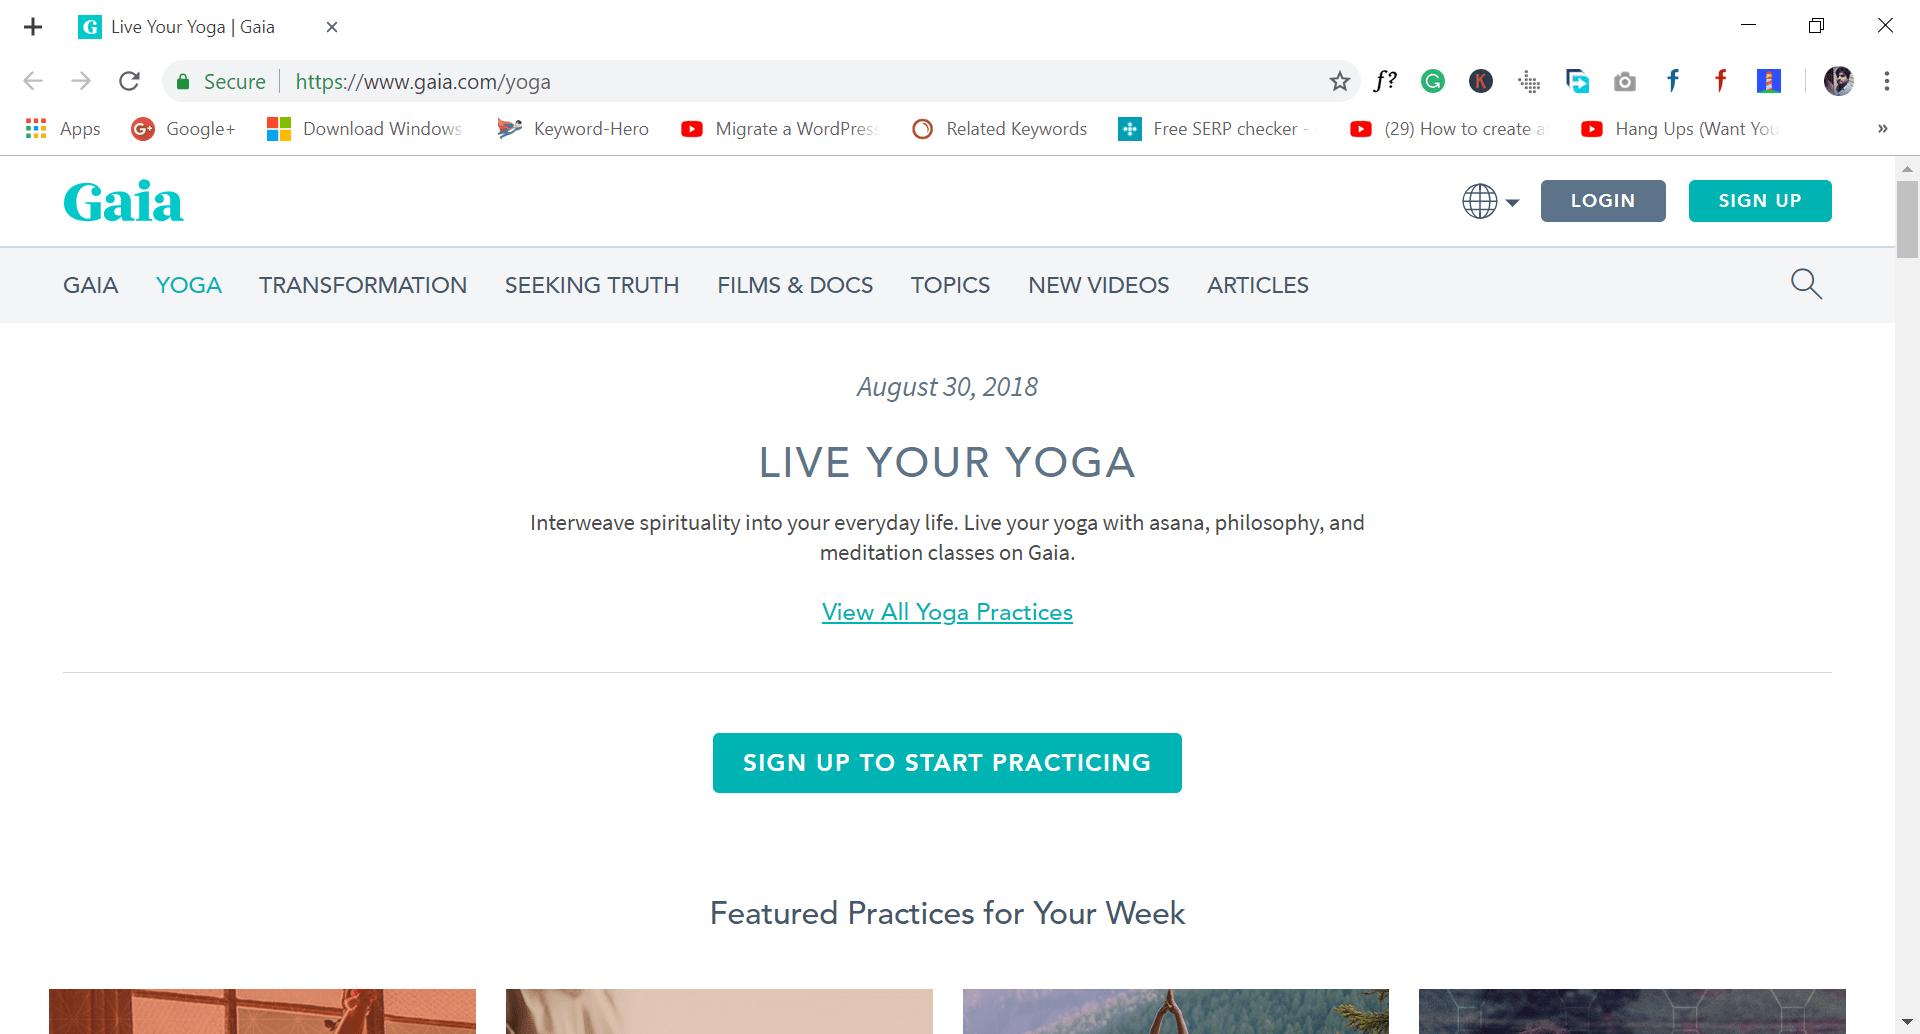 gaia -site like wish.com